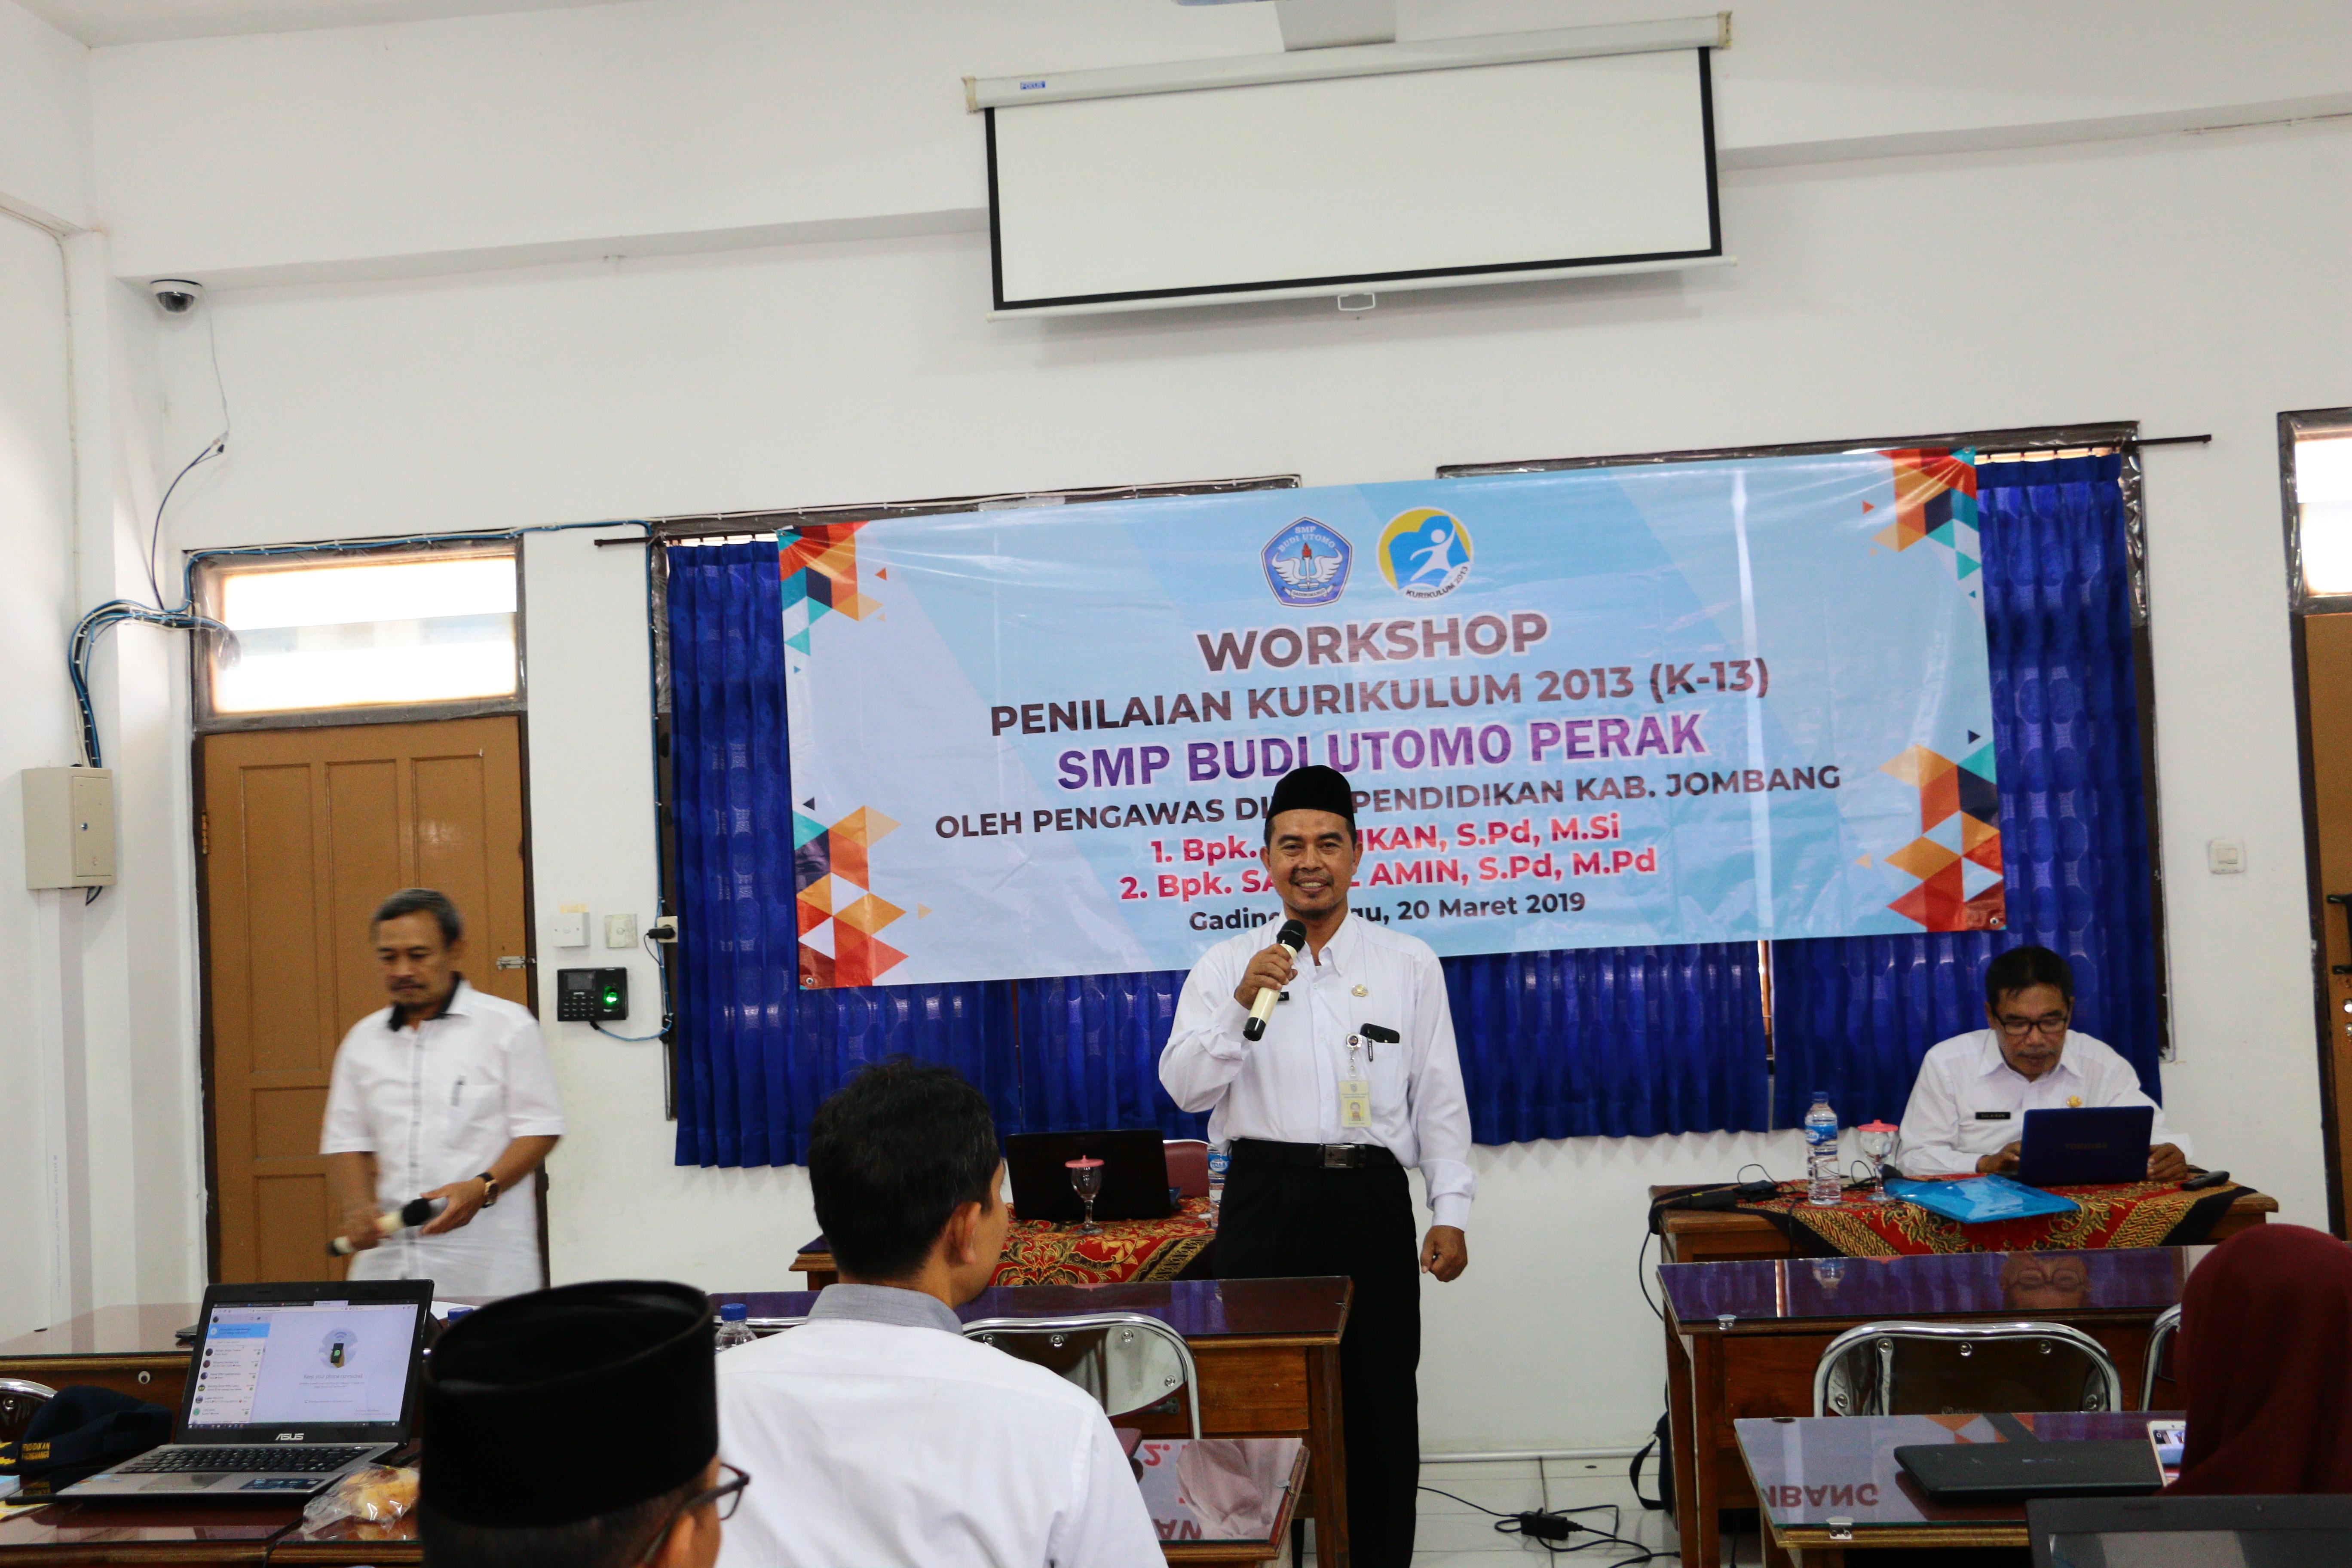 Workshop Penilaian Kurikulum Nasional Bagi Guru-guru SMP Budi Utomo Perak - Bapak Saiful Amin, S.Pd., M.Pd.